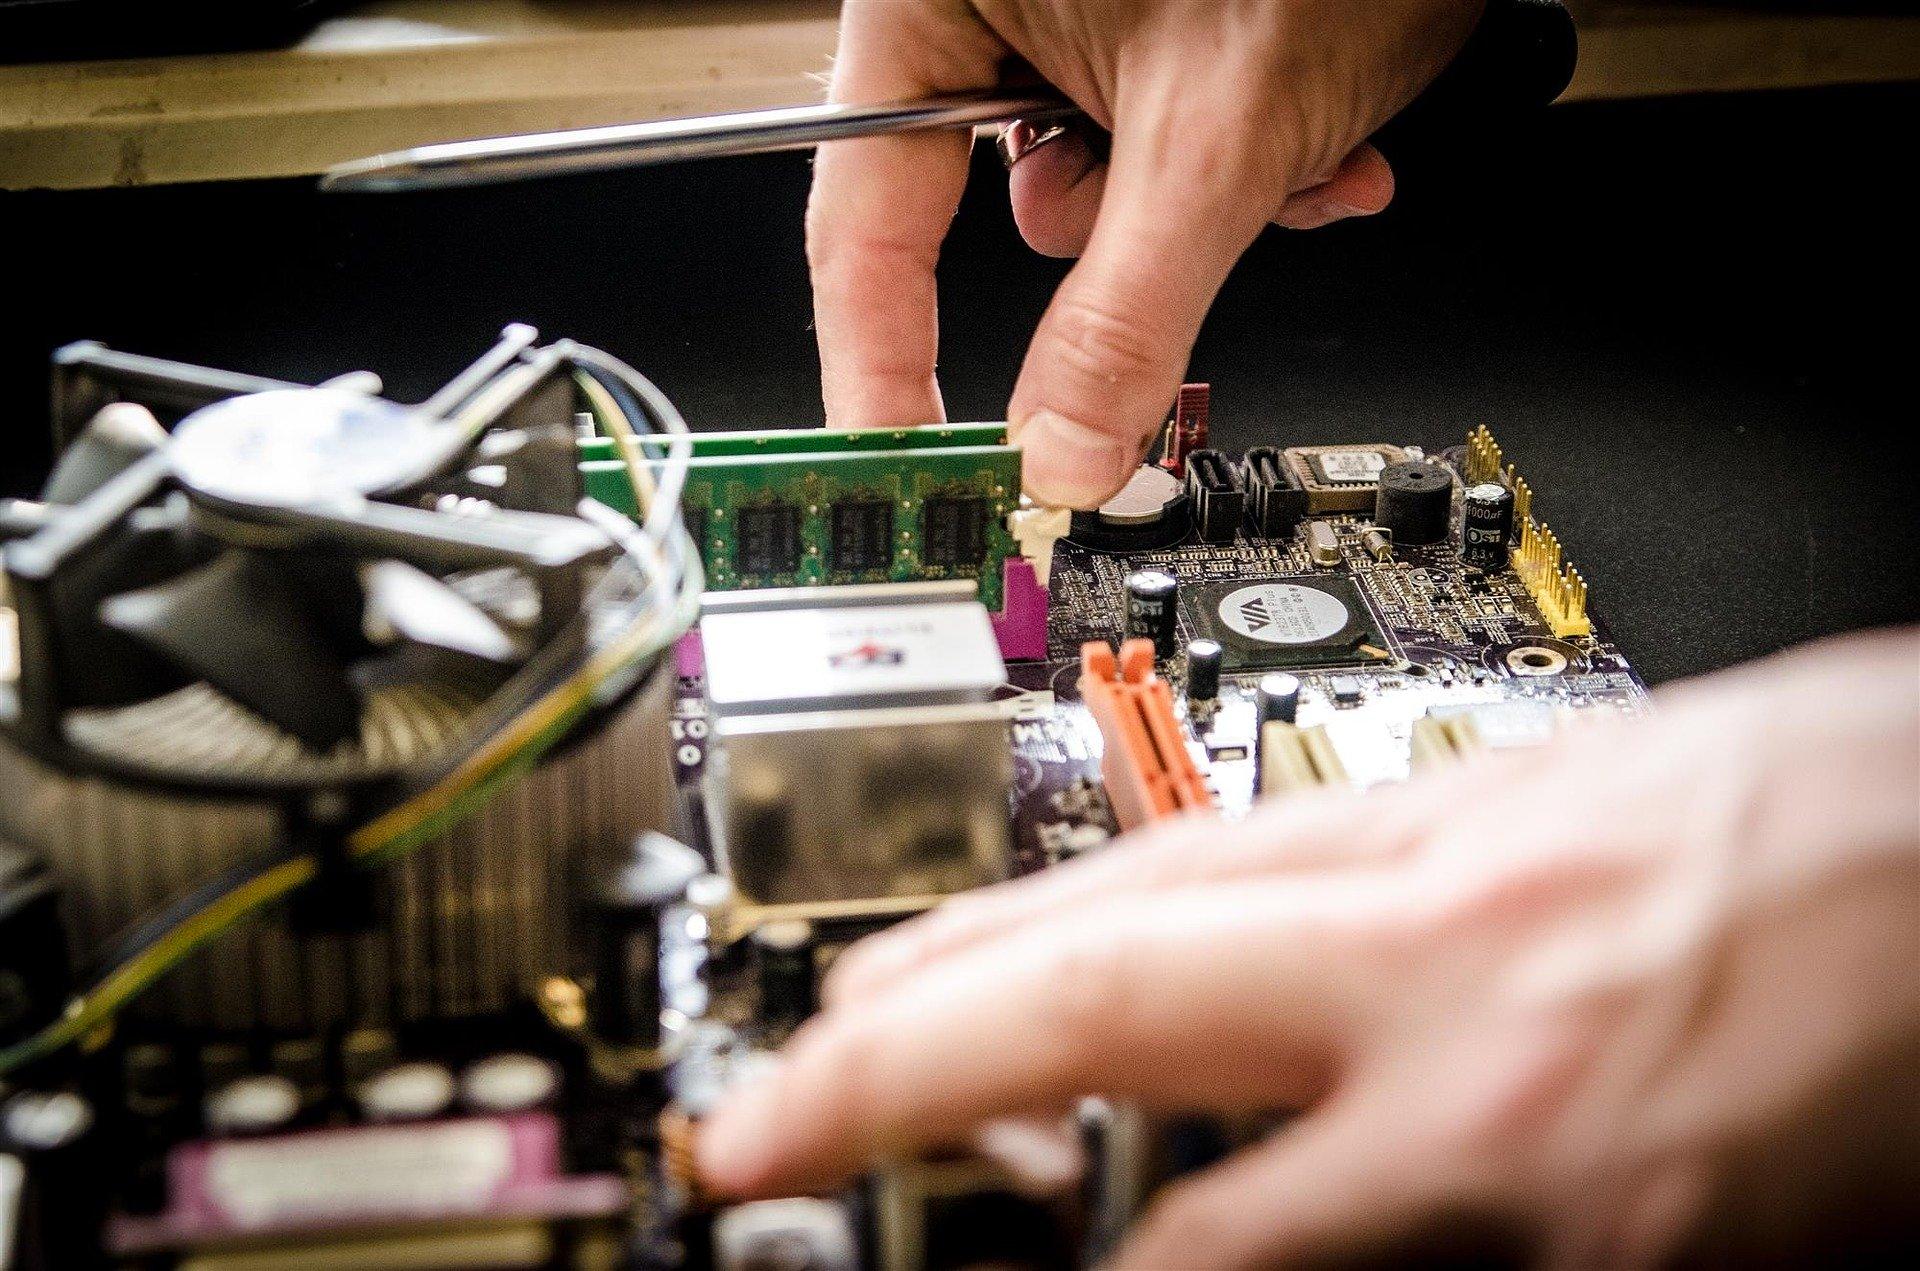 Elektronik- und High-Tech-Industrie